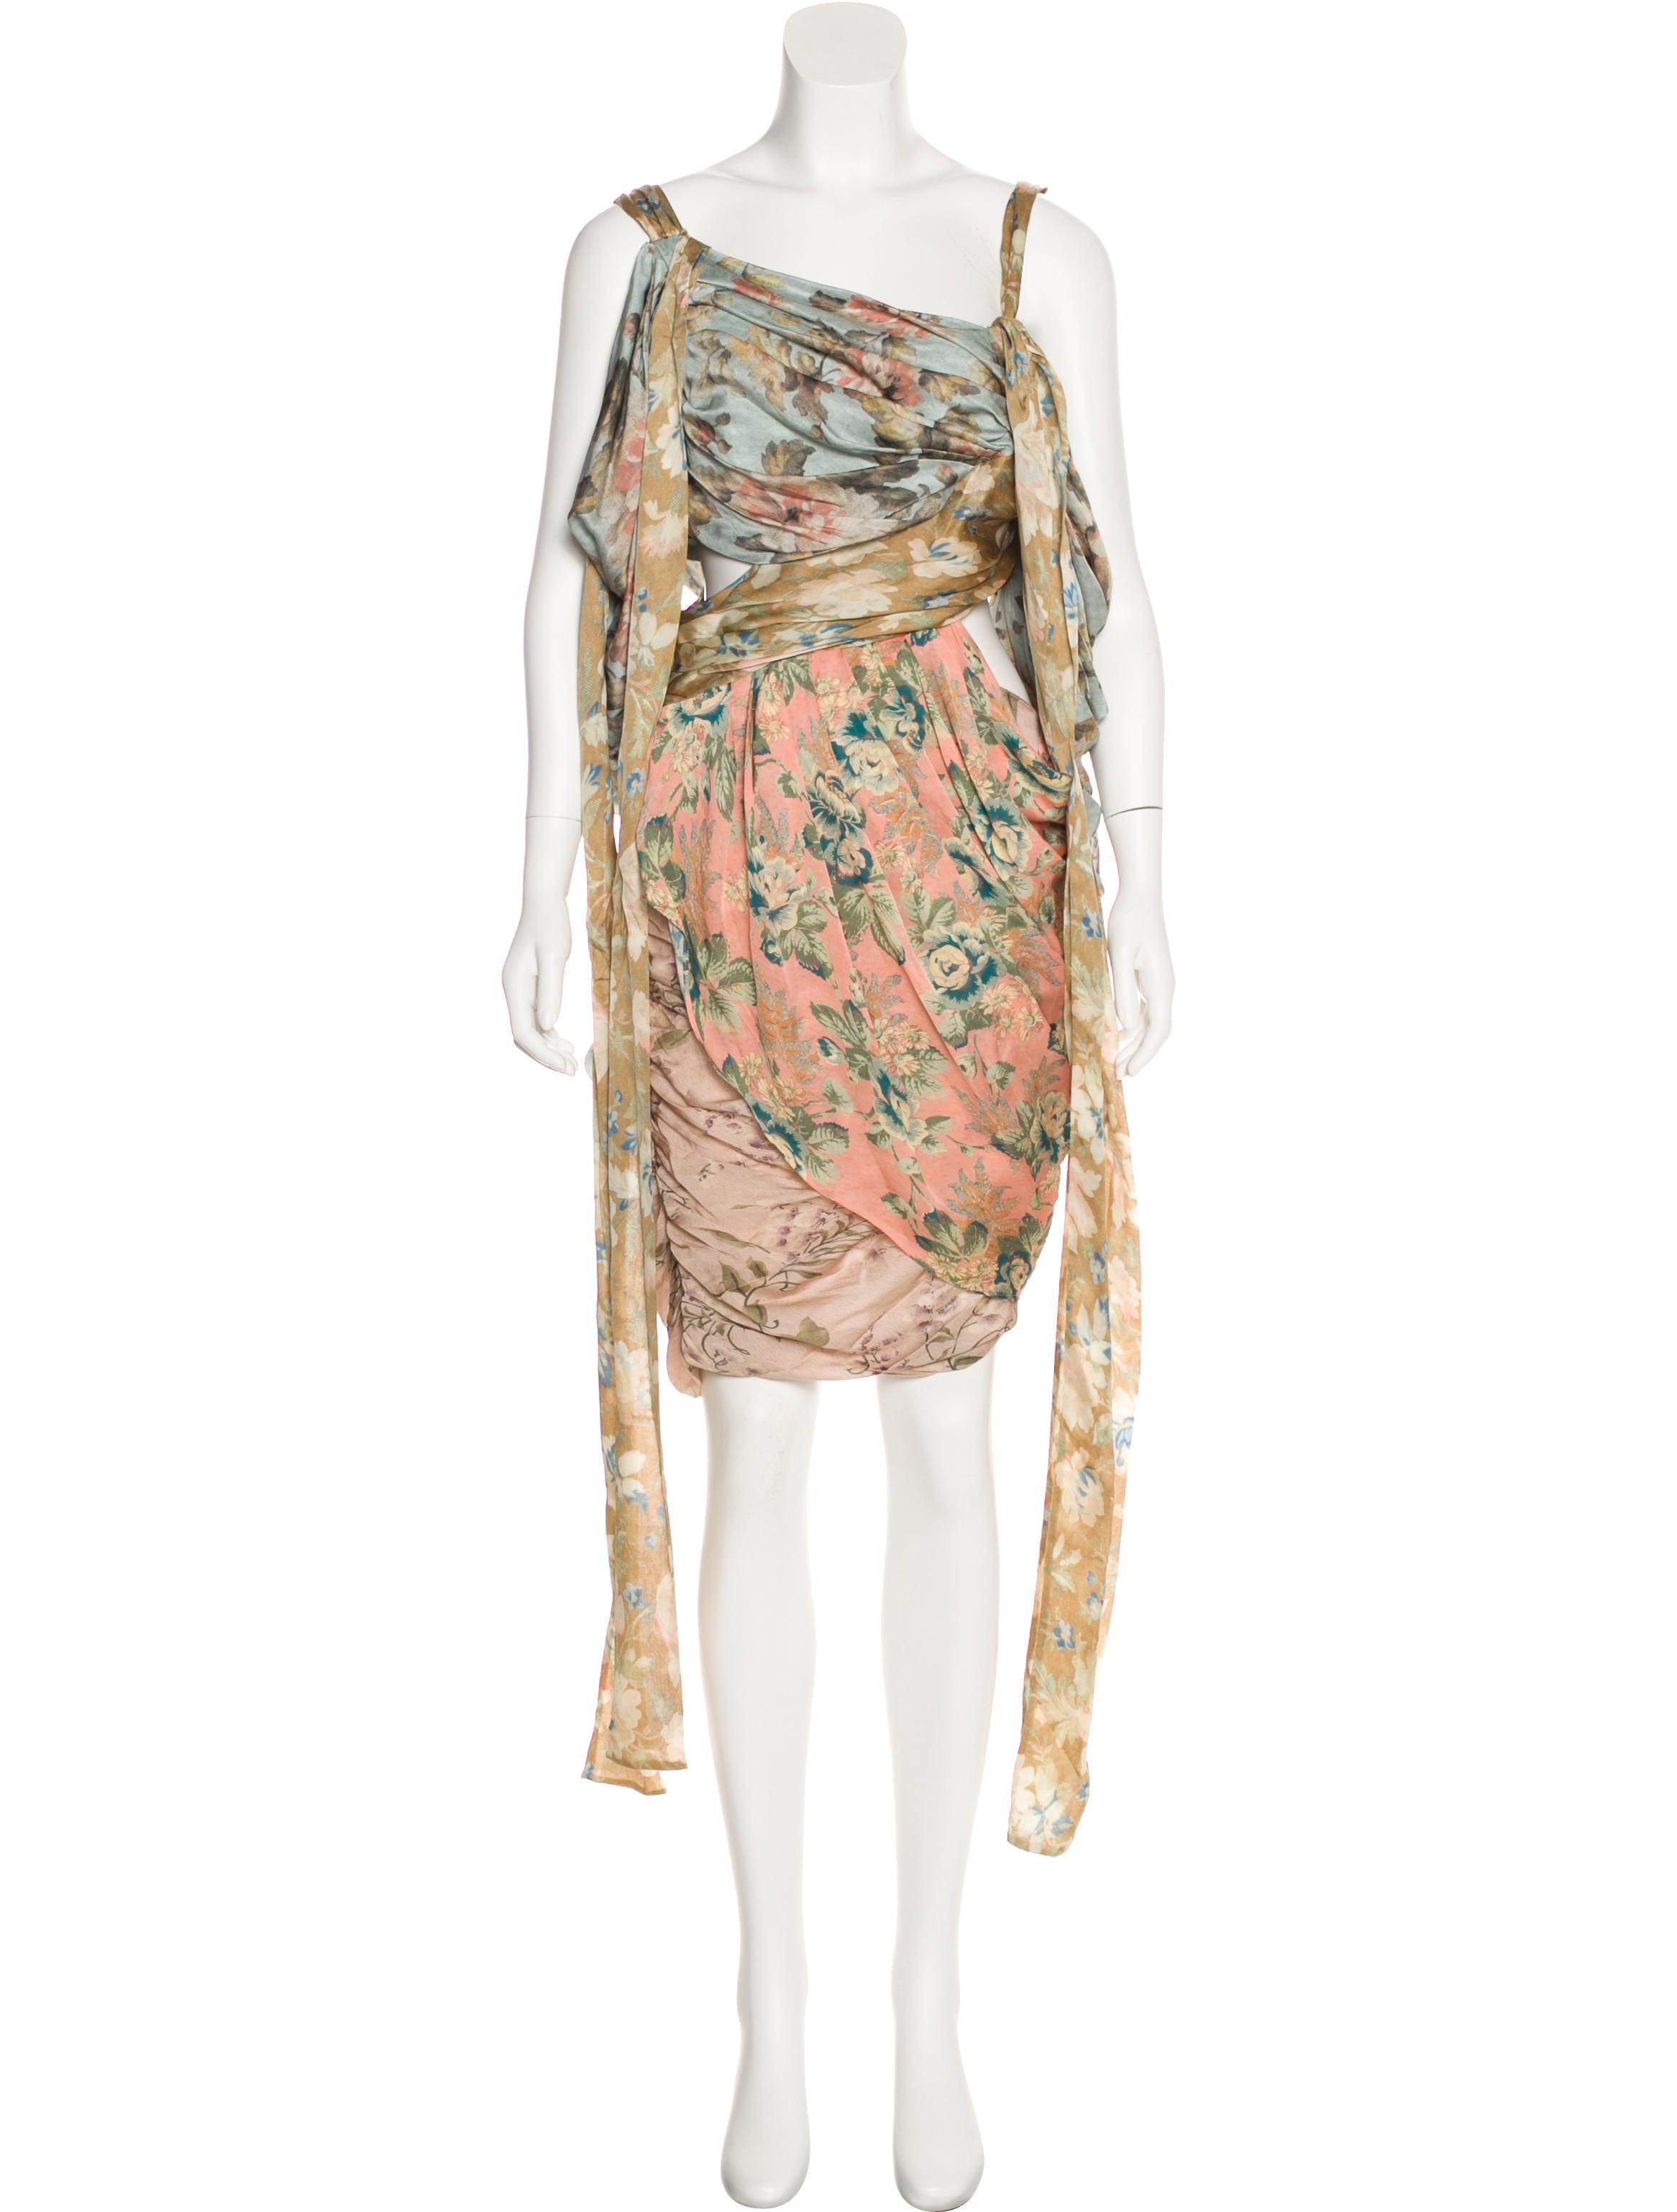 14217d6f89eb8 Zimmermann 2018 Unbridled Elixir Silk Mini Dress w/ Tags - Clothing ...